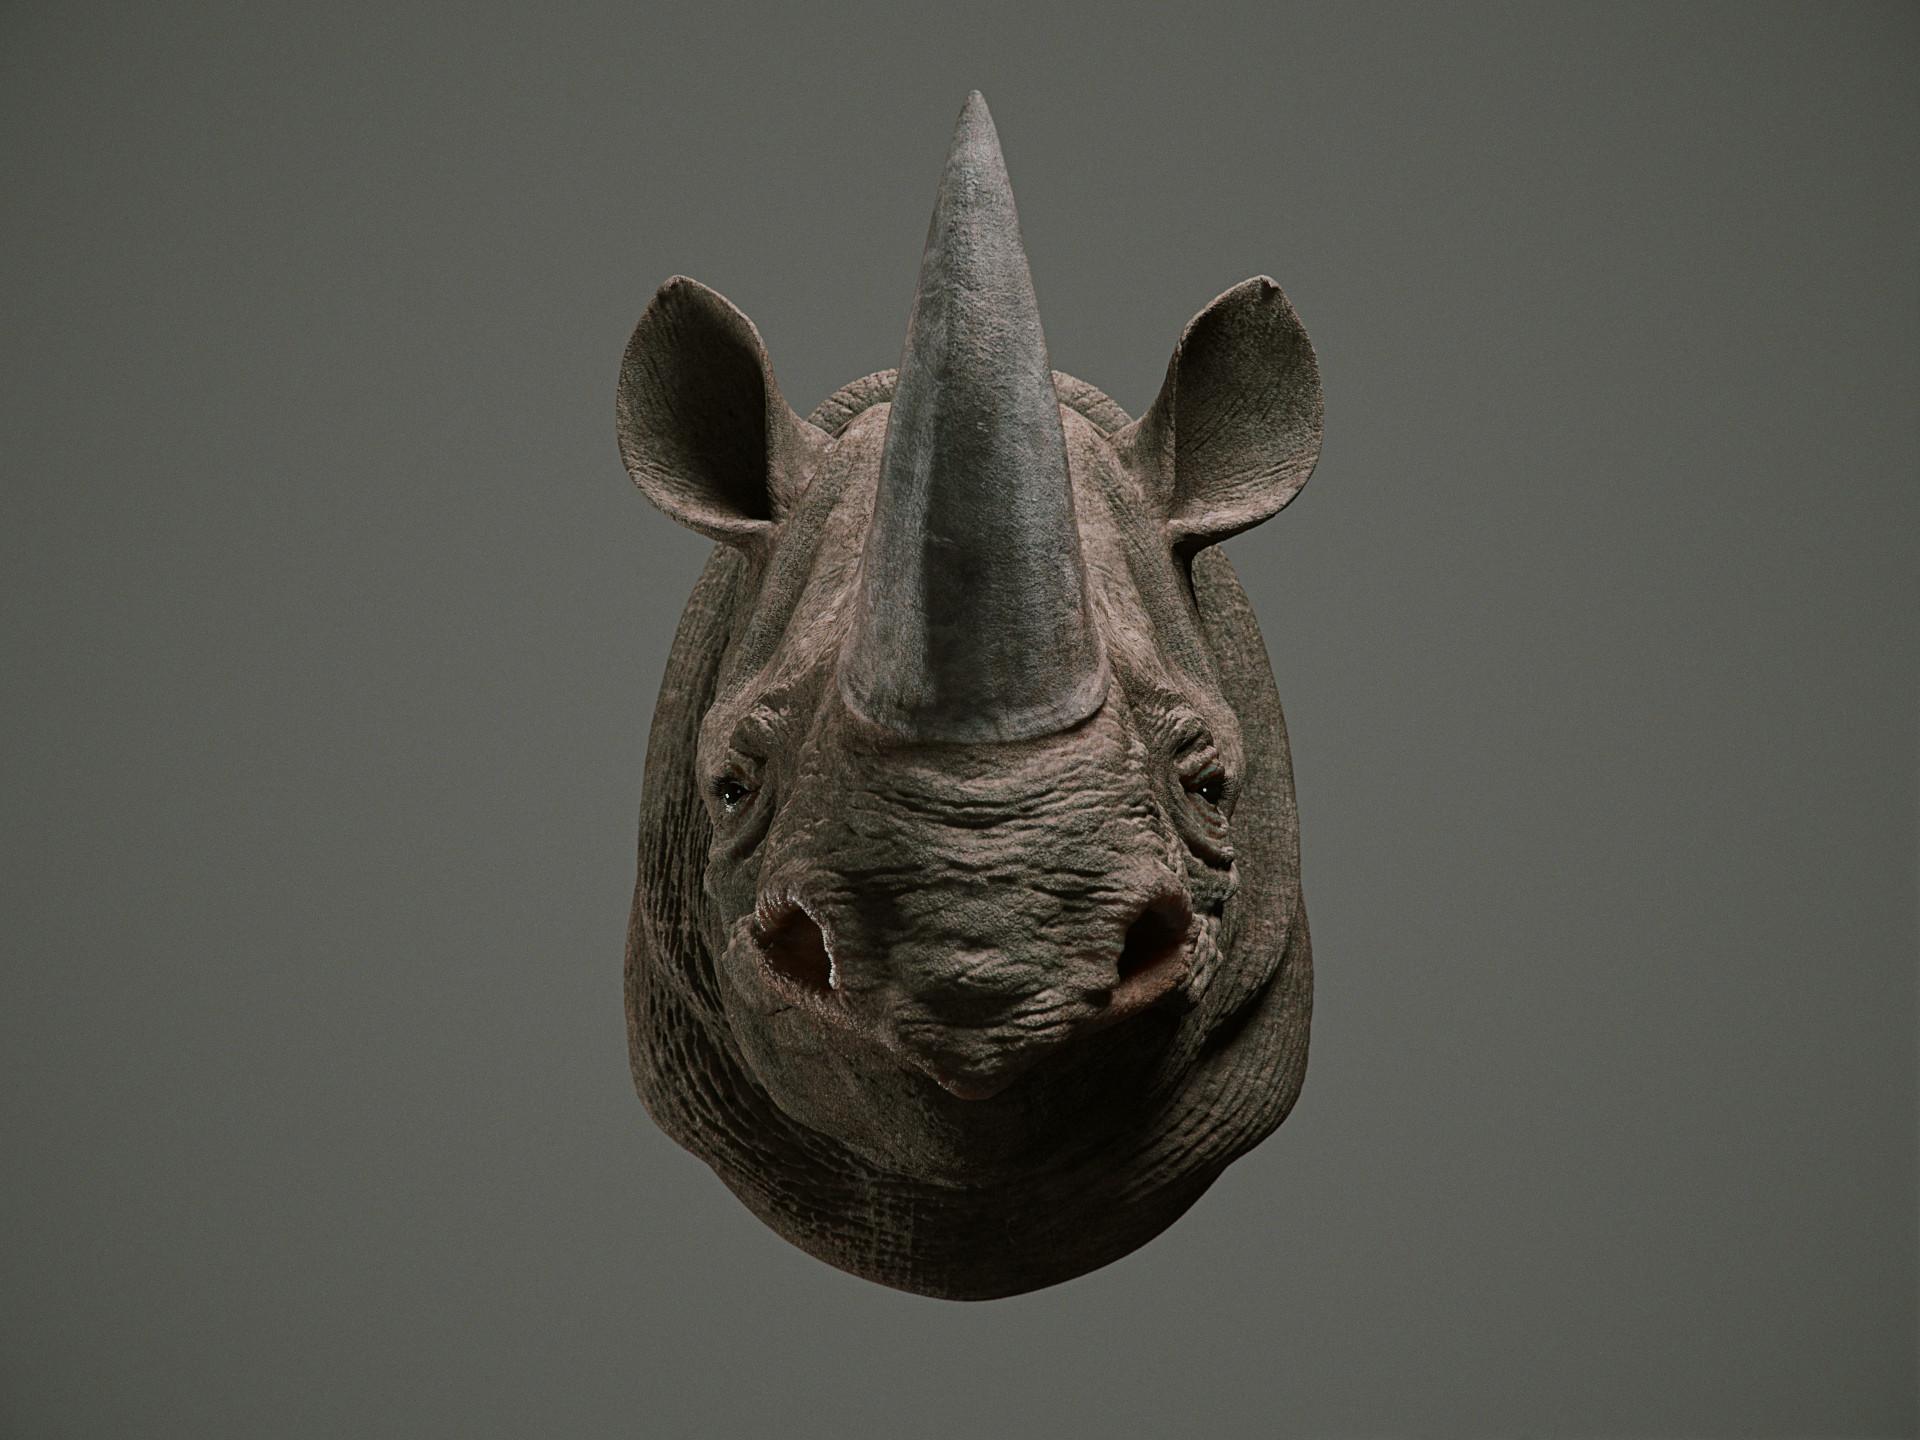 Cgmonkeyking rhino pn01 pp 0001